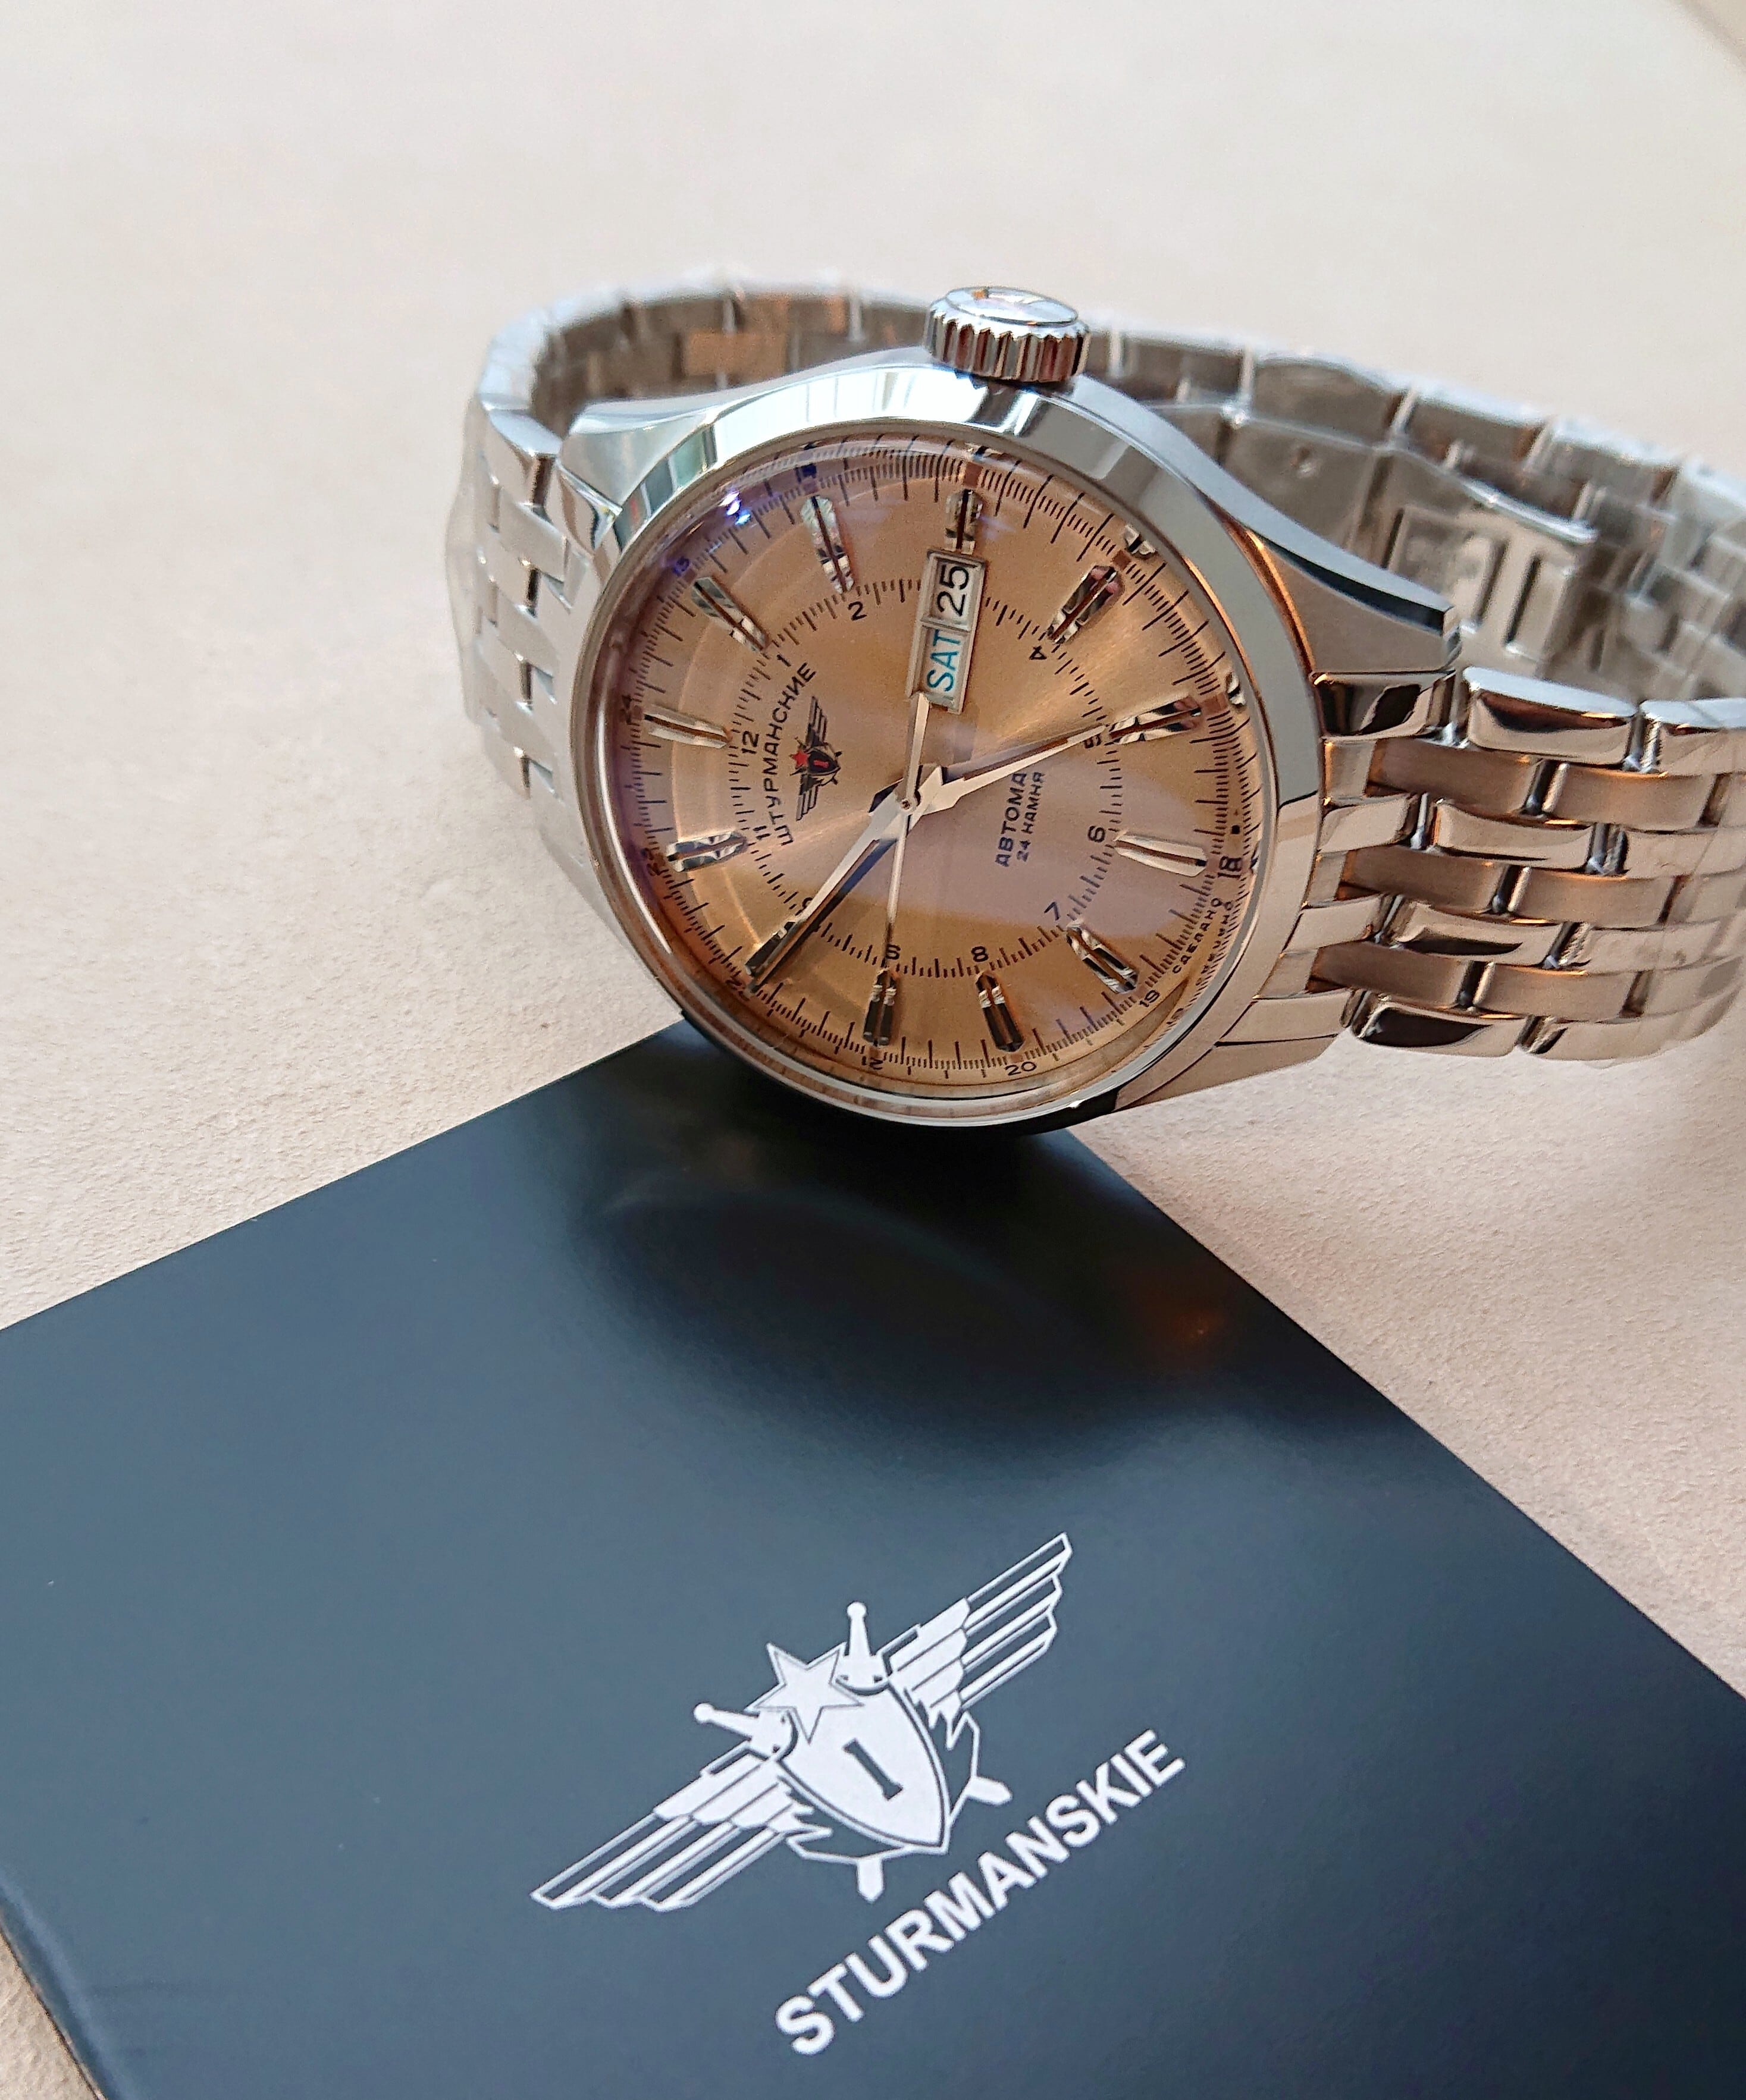 【STURMANSKIE シュトゥルマンスキー】OPEN SPACE/オープンスペース(ブレスレット)/国内正規品 腕時計